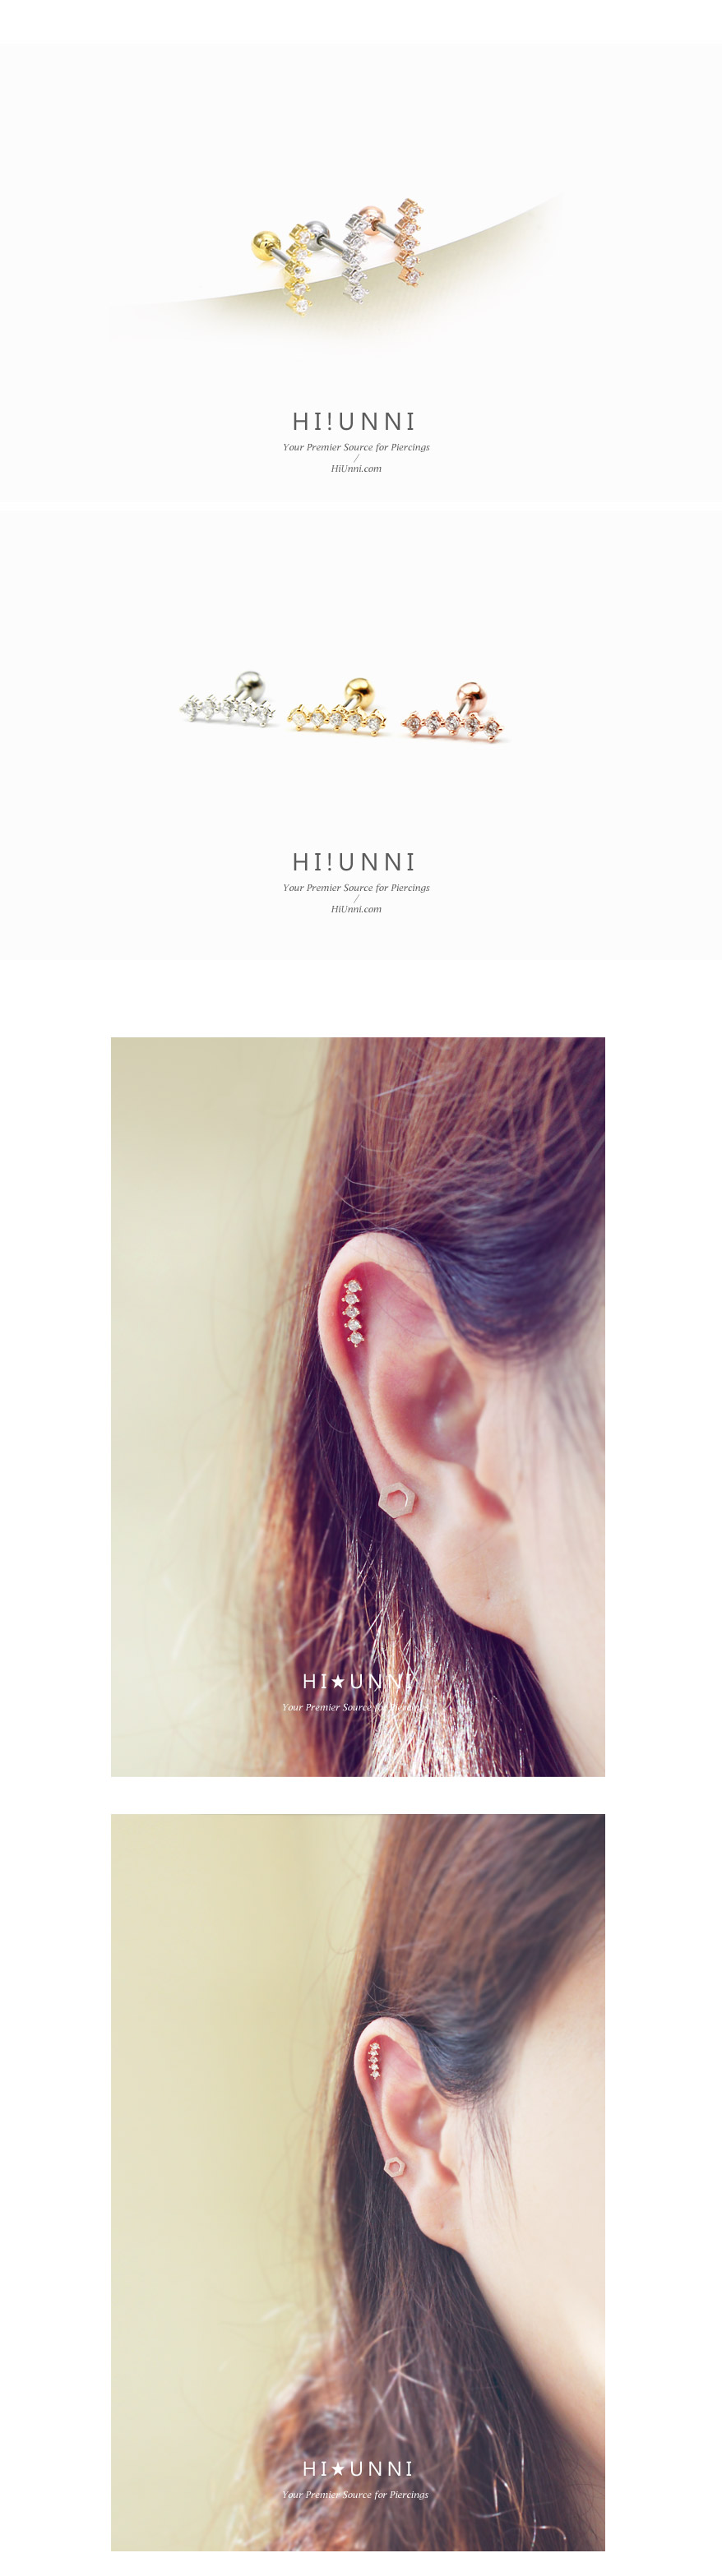 jewelry_earrings_stud_cartilage_piercing_16g_barbell_316l_cz_helix_earring_tragus_4